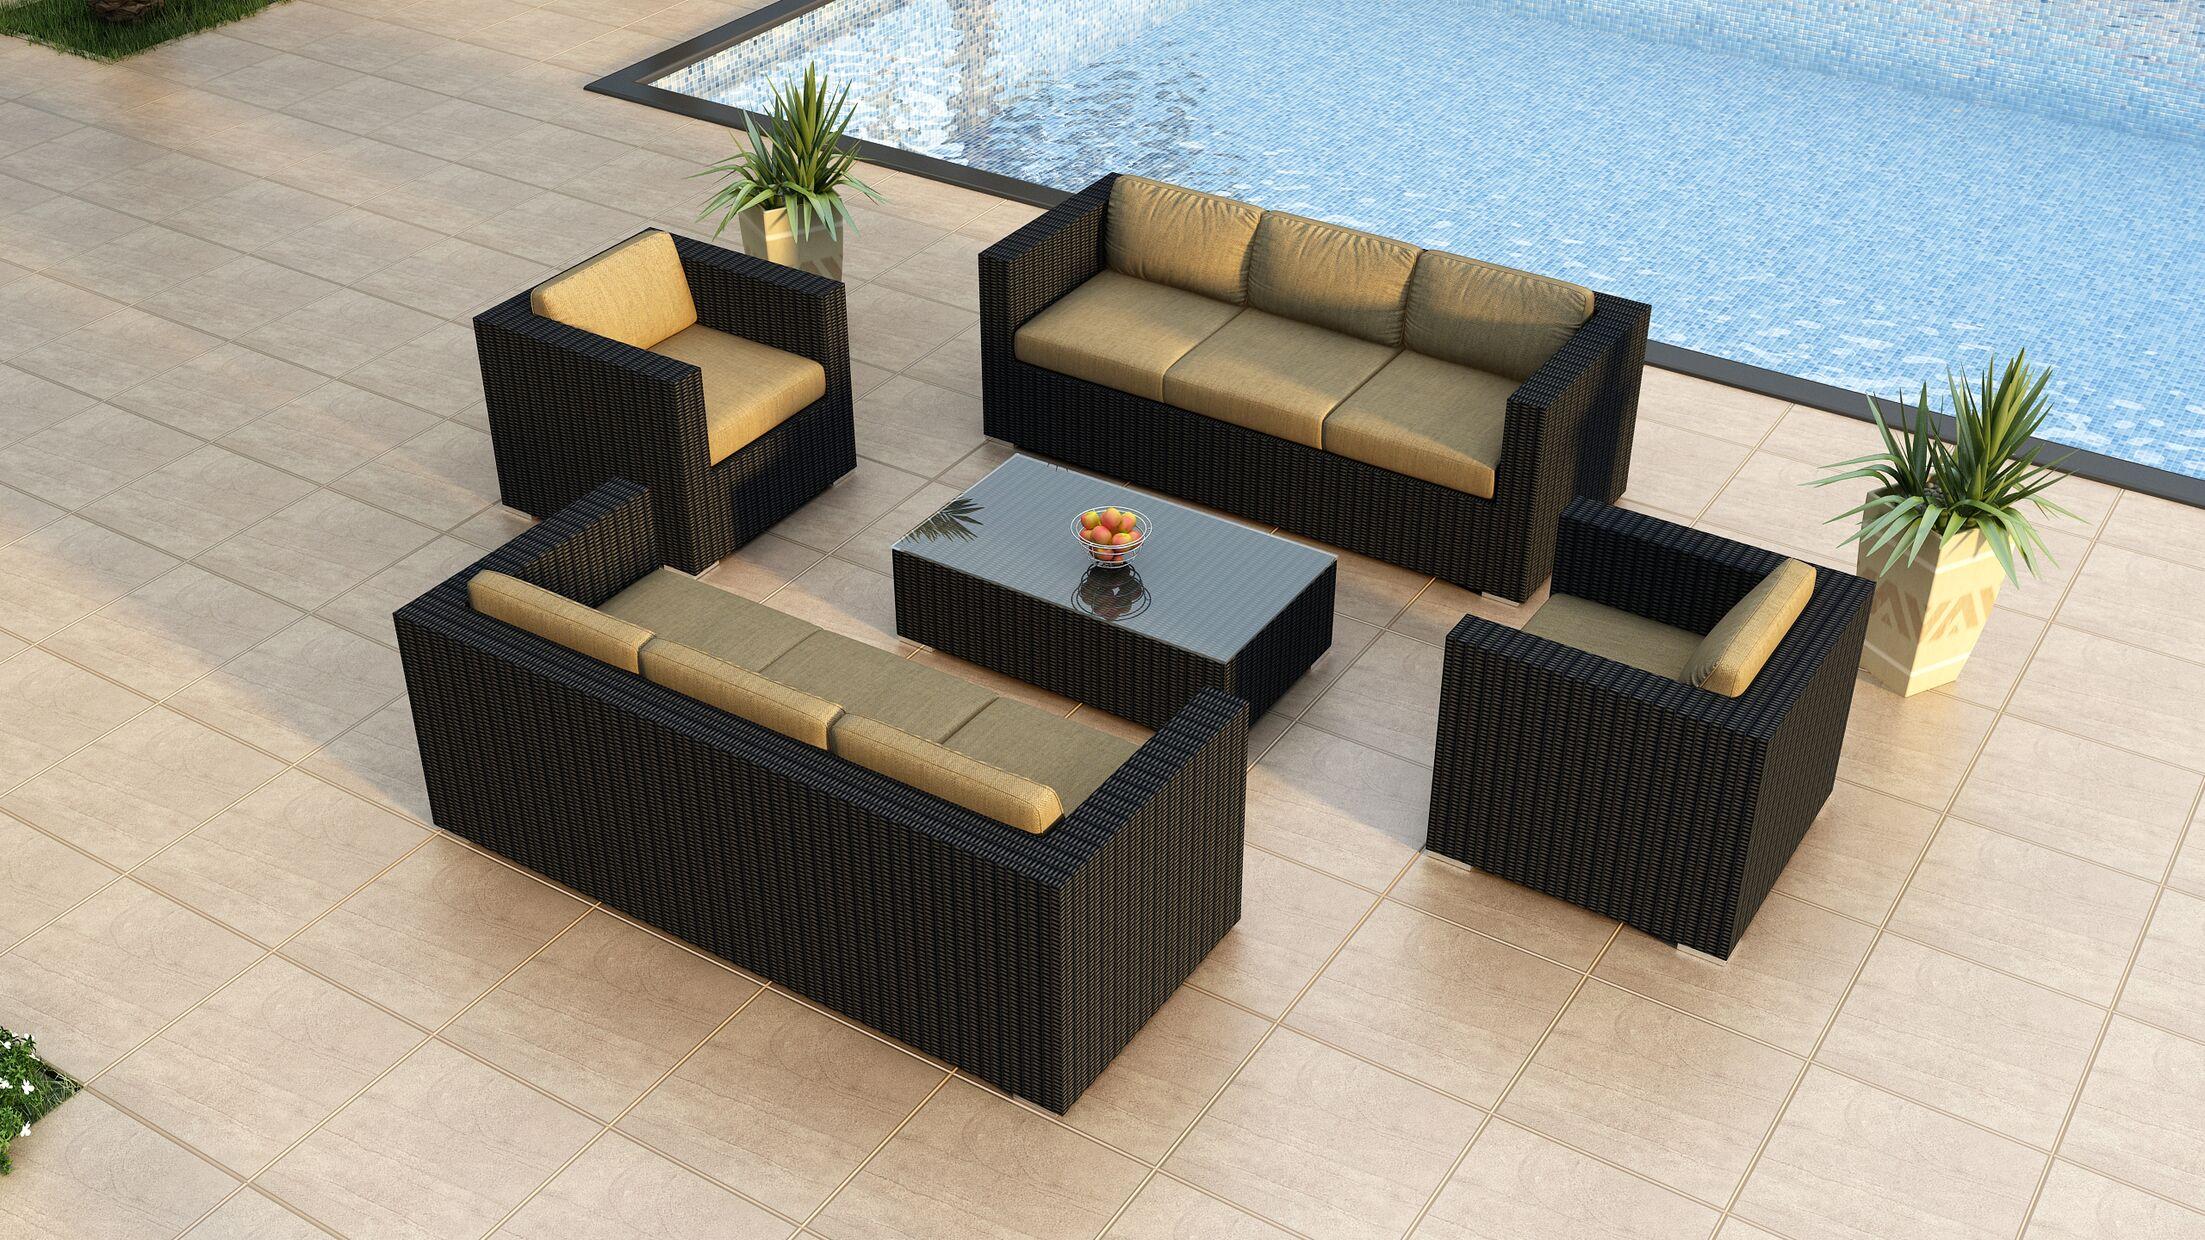 Urbana 5 Piece Double Sofa Set with Cushions Fabric: Beige